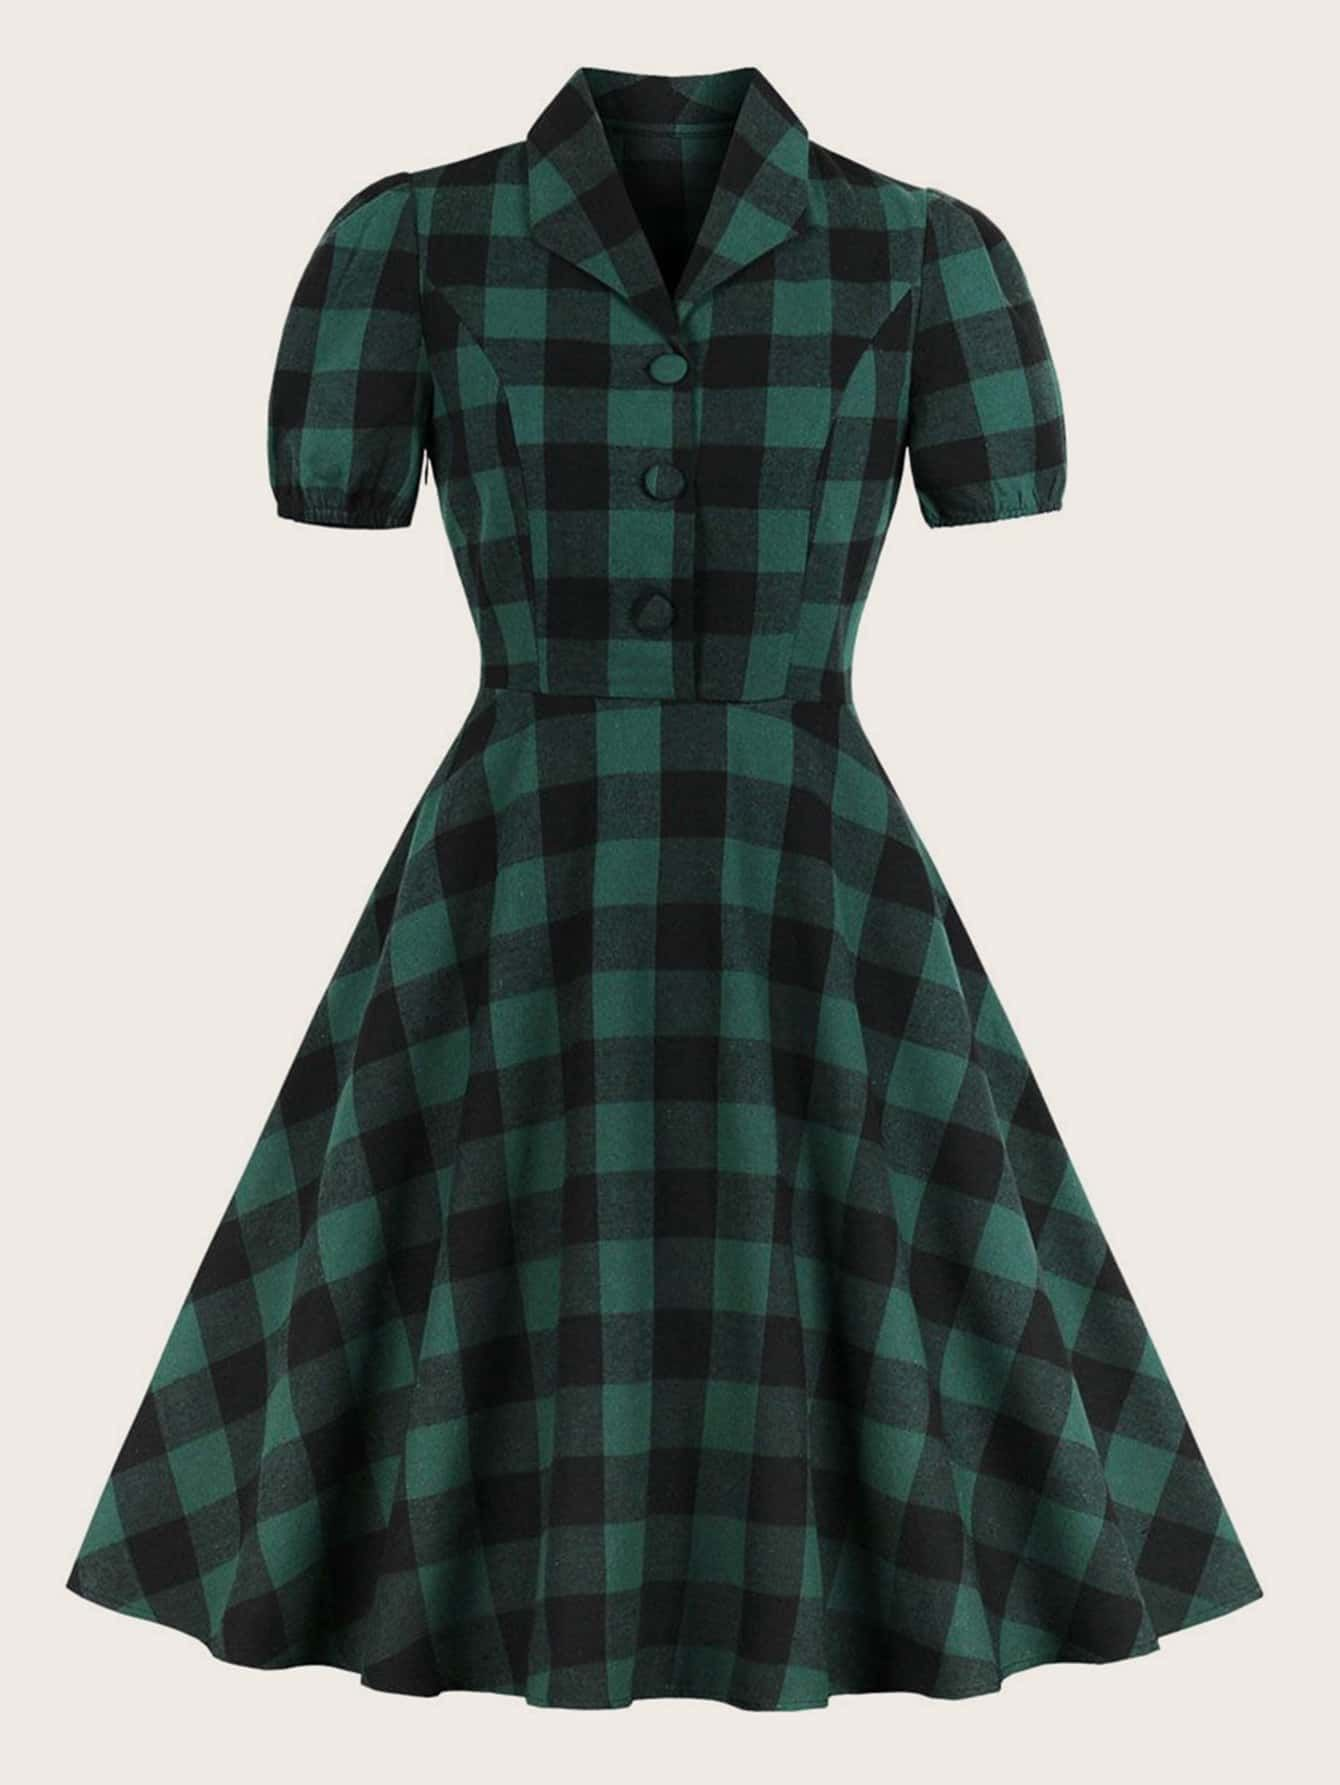 Plus Buffalo Plaid Fit And Fla In 2020 Plaid Dress Vintage Green Plaid Dress Vintage Shirt Dress [ 1785 x 1340 Pixel ]